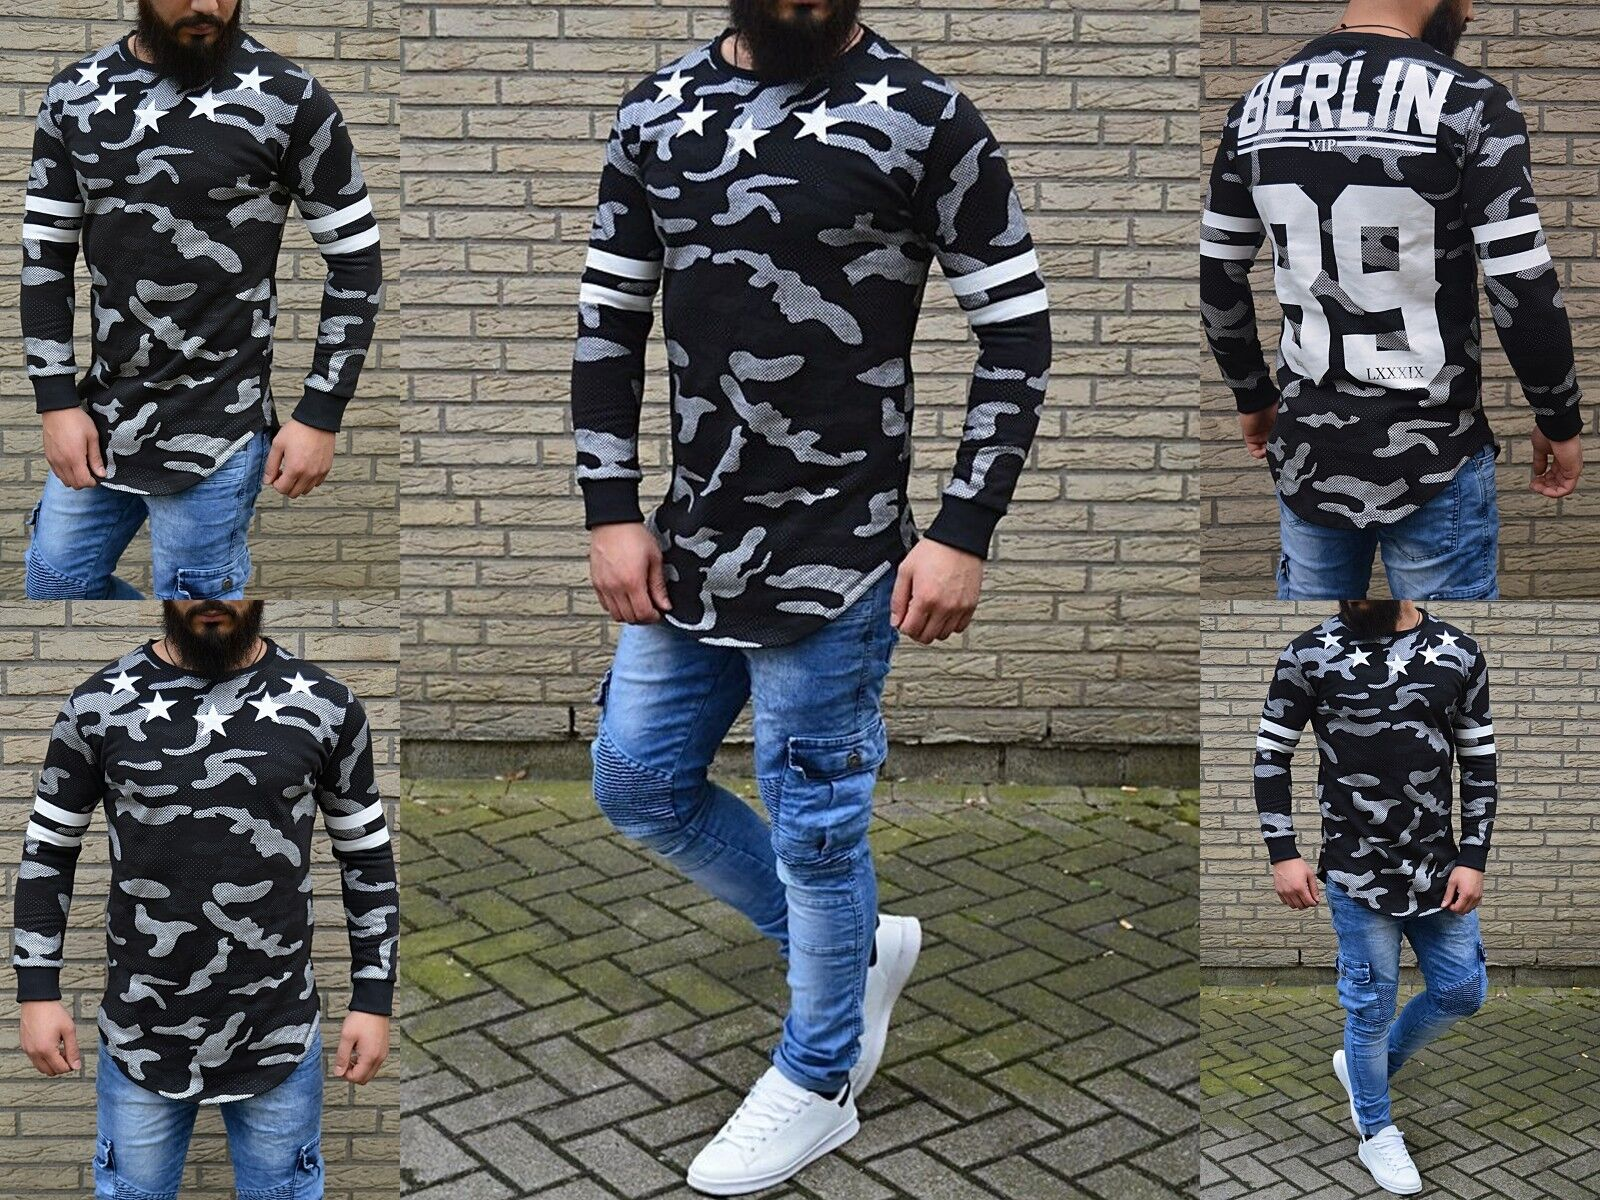 Funny Fashion Men's Style Shakur Dancer Hip Hop Style Longshirt Berlin